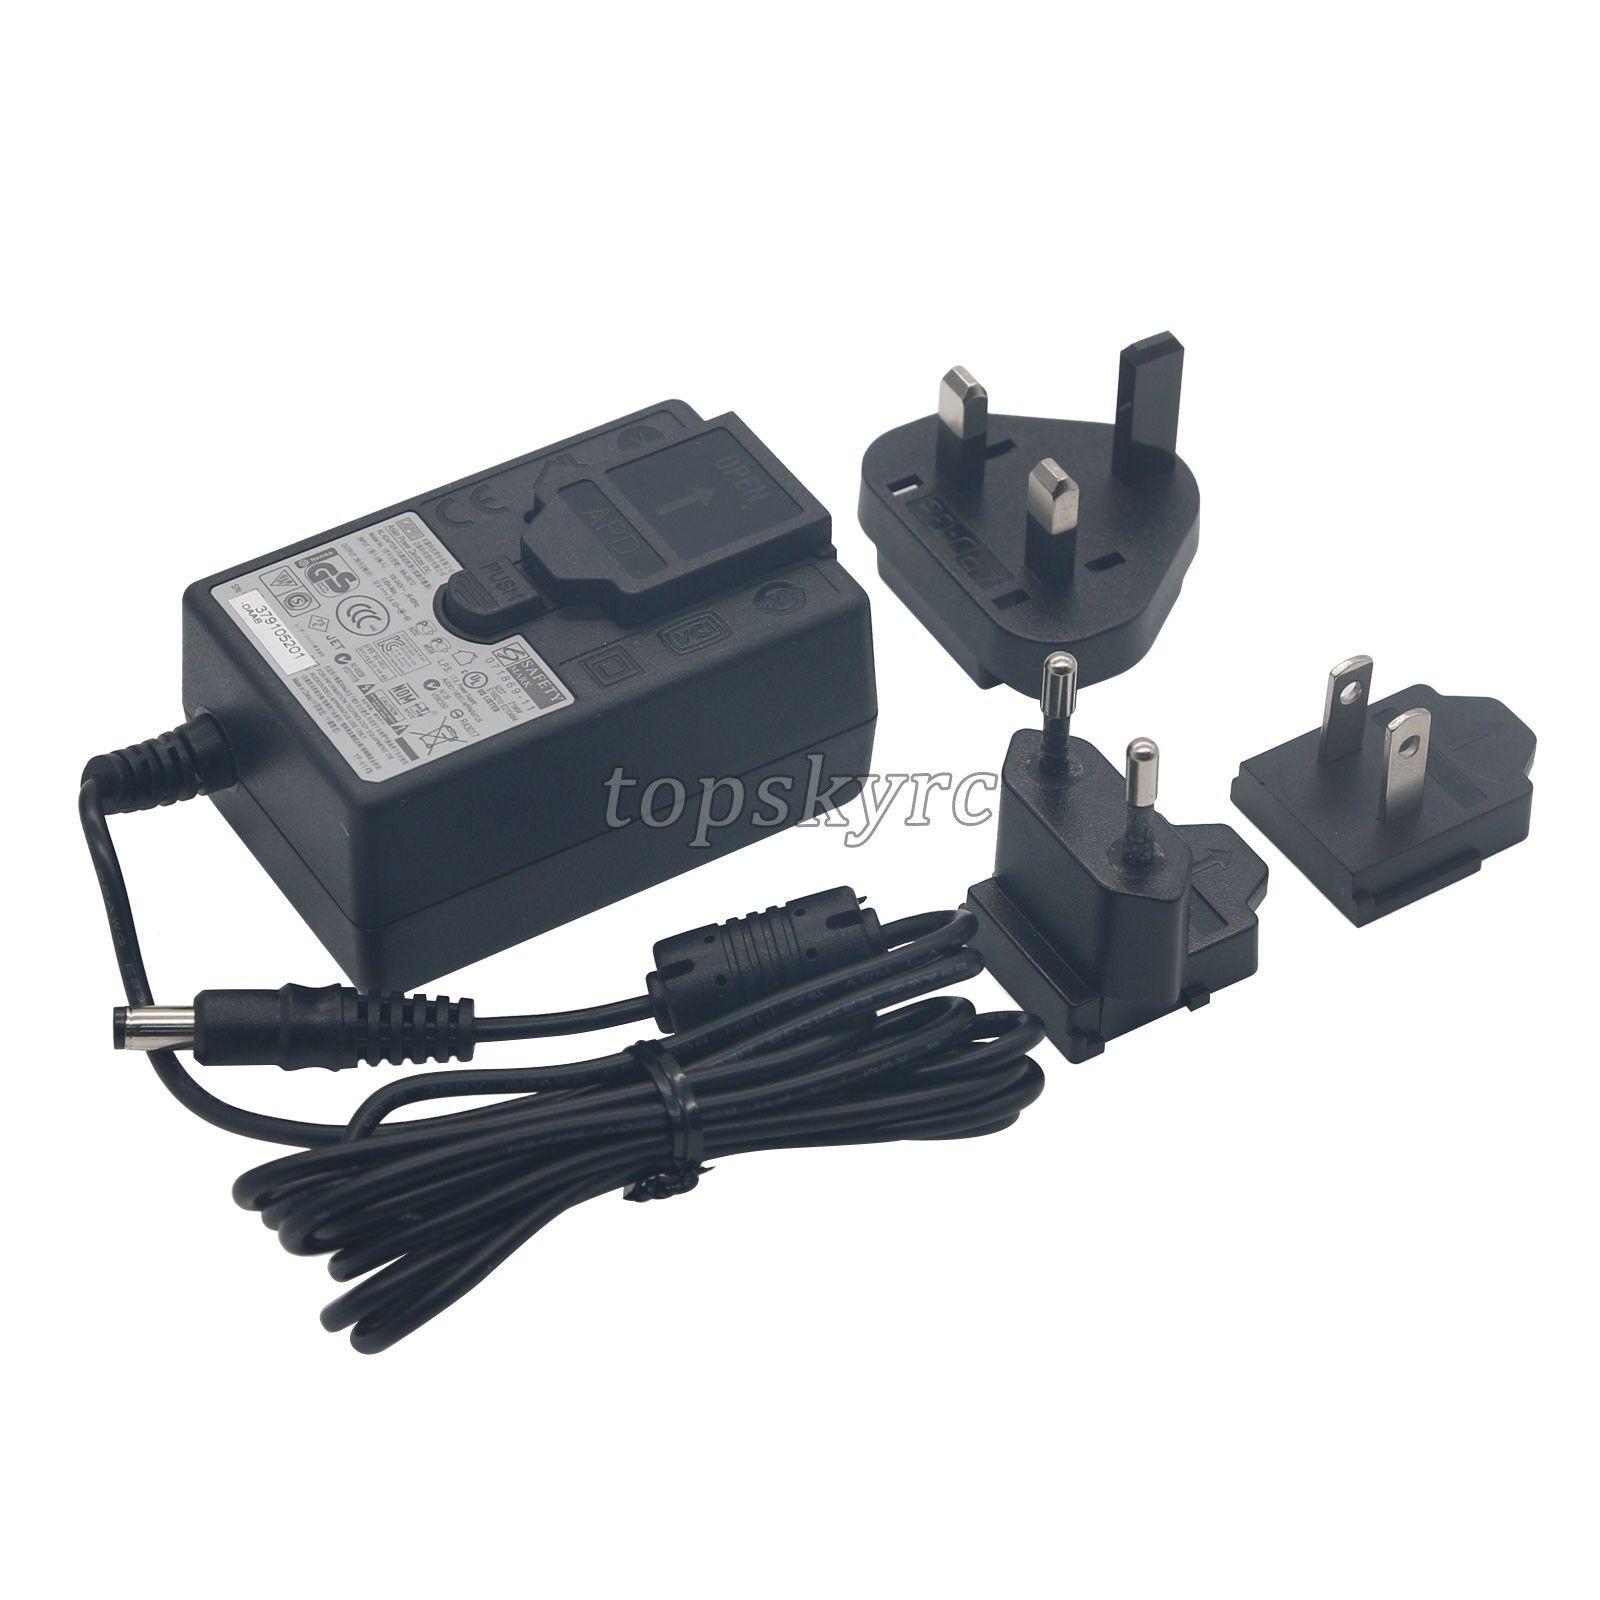 KC901S 4GHz Network Antenna Spectrum RF Vector Analyzer Field Strength S11 VNA